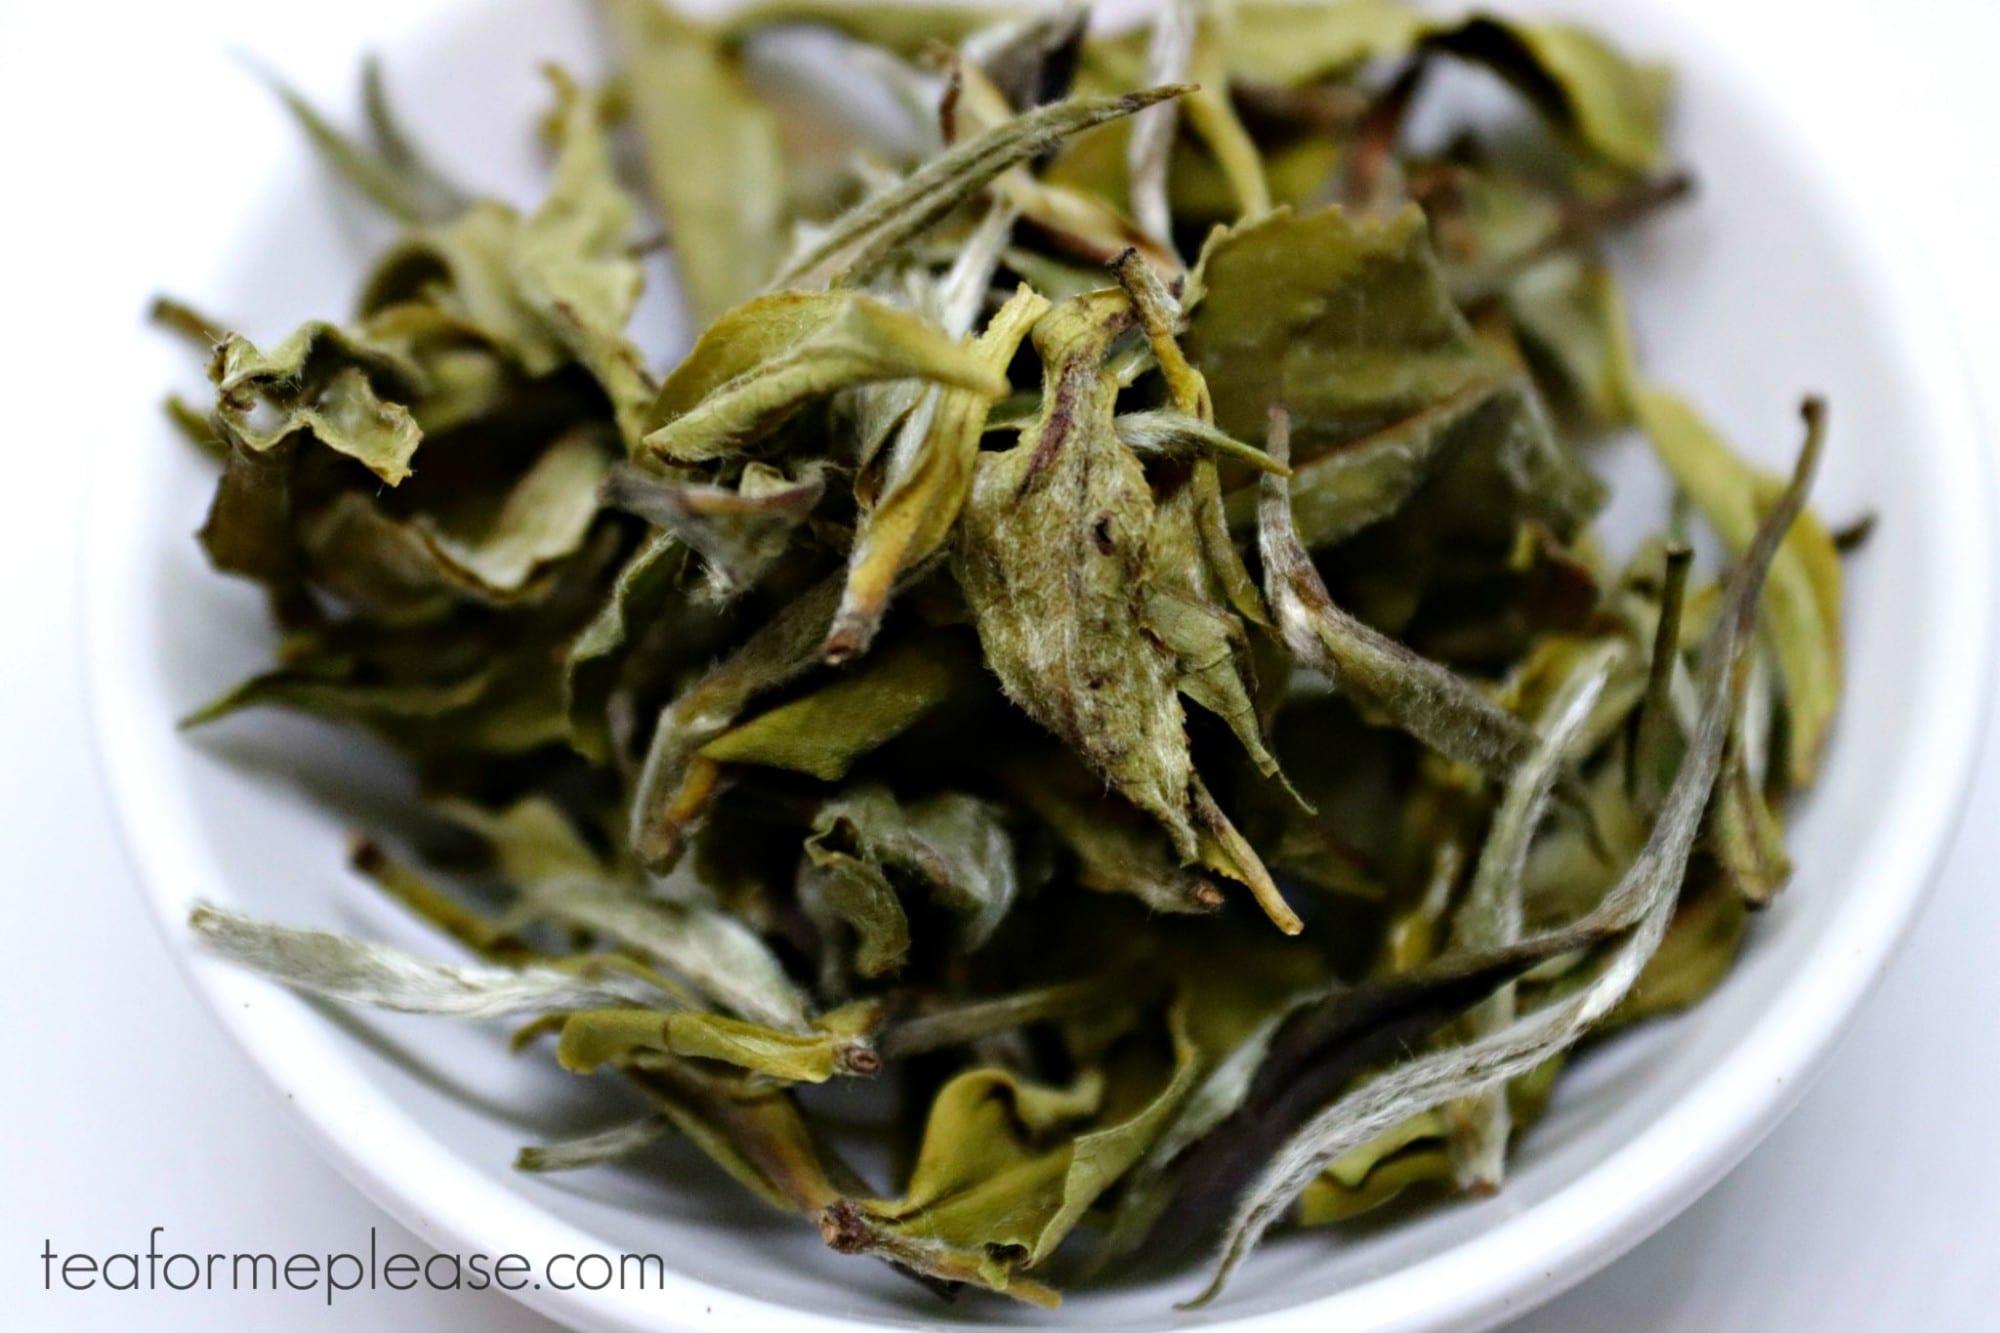 Nepali Tea Traders Ama Dablam Organic White Tea